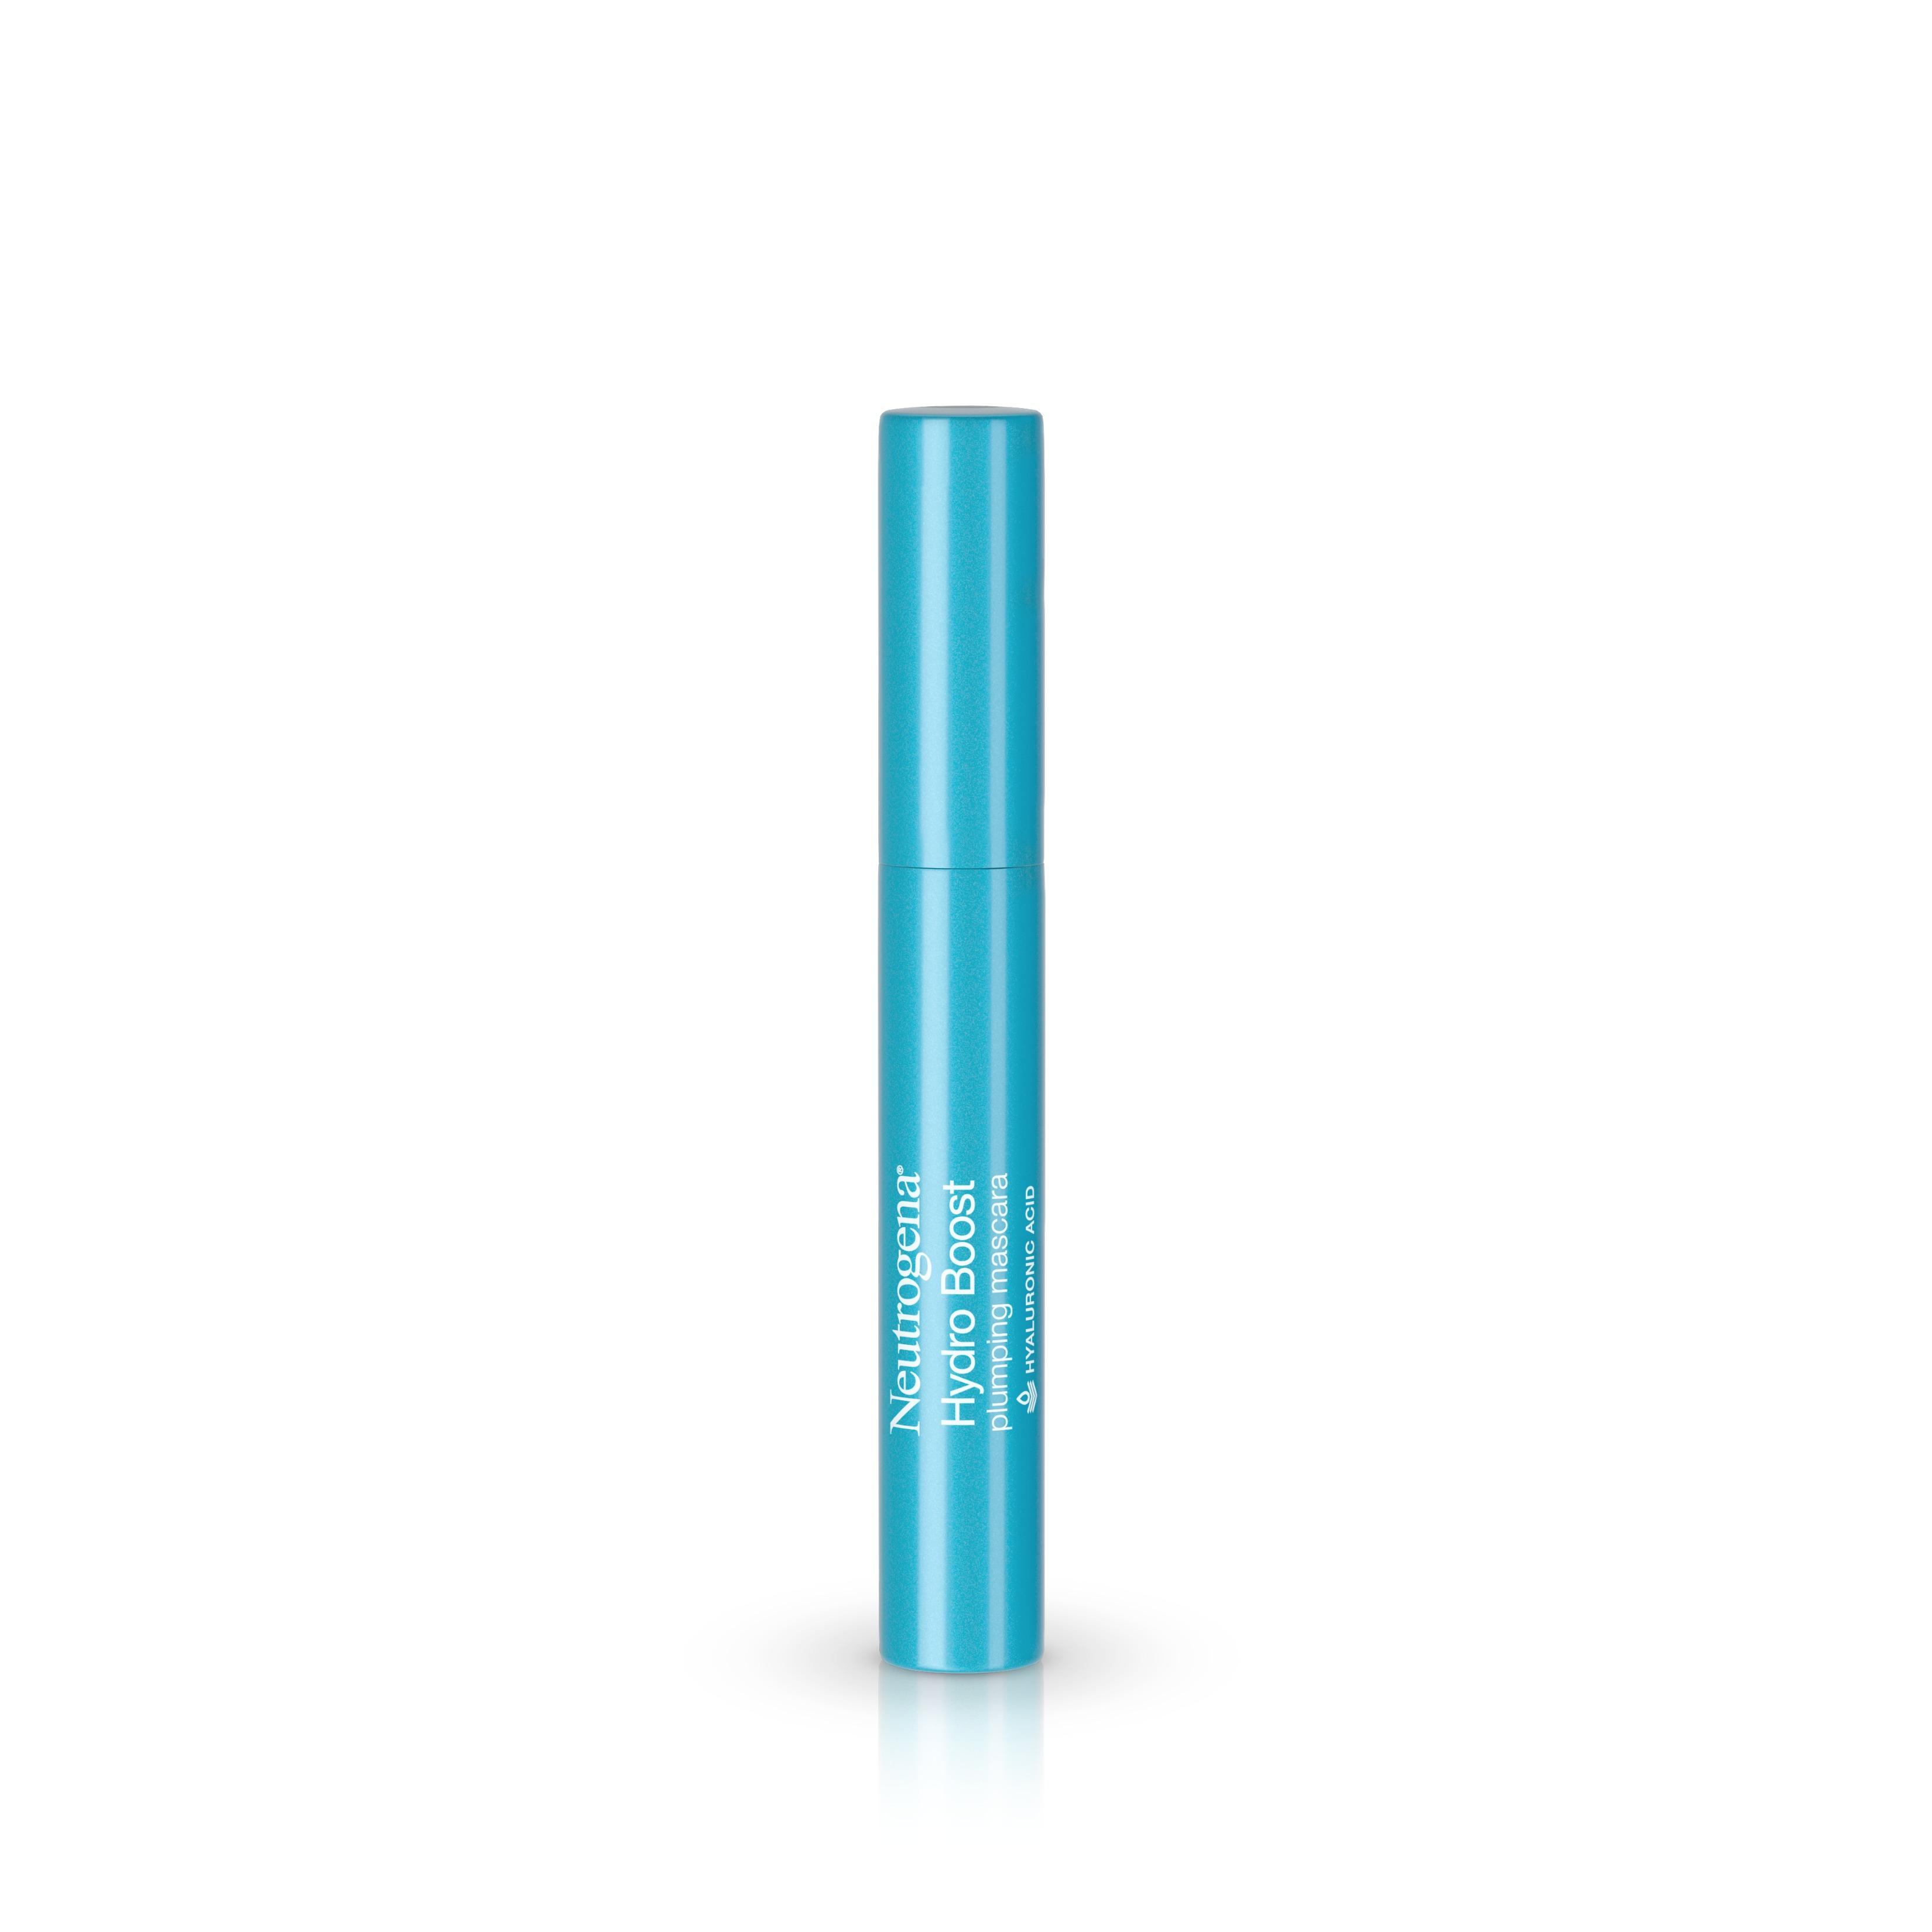 Neutrogena Hydro Boost Plumping Mascara Black/Brown 03,.21 oz